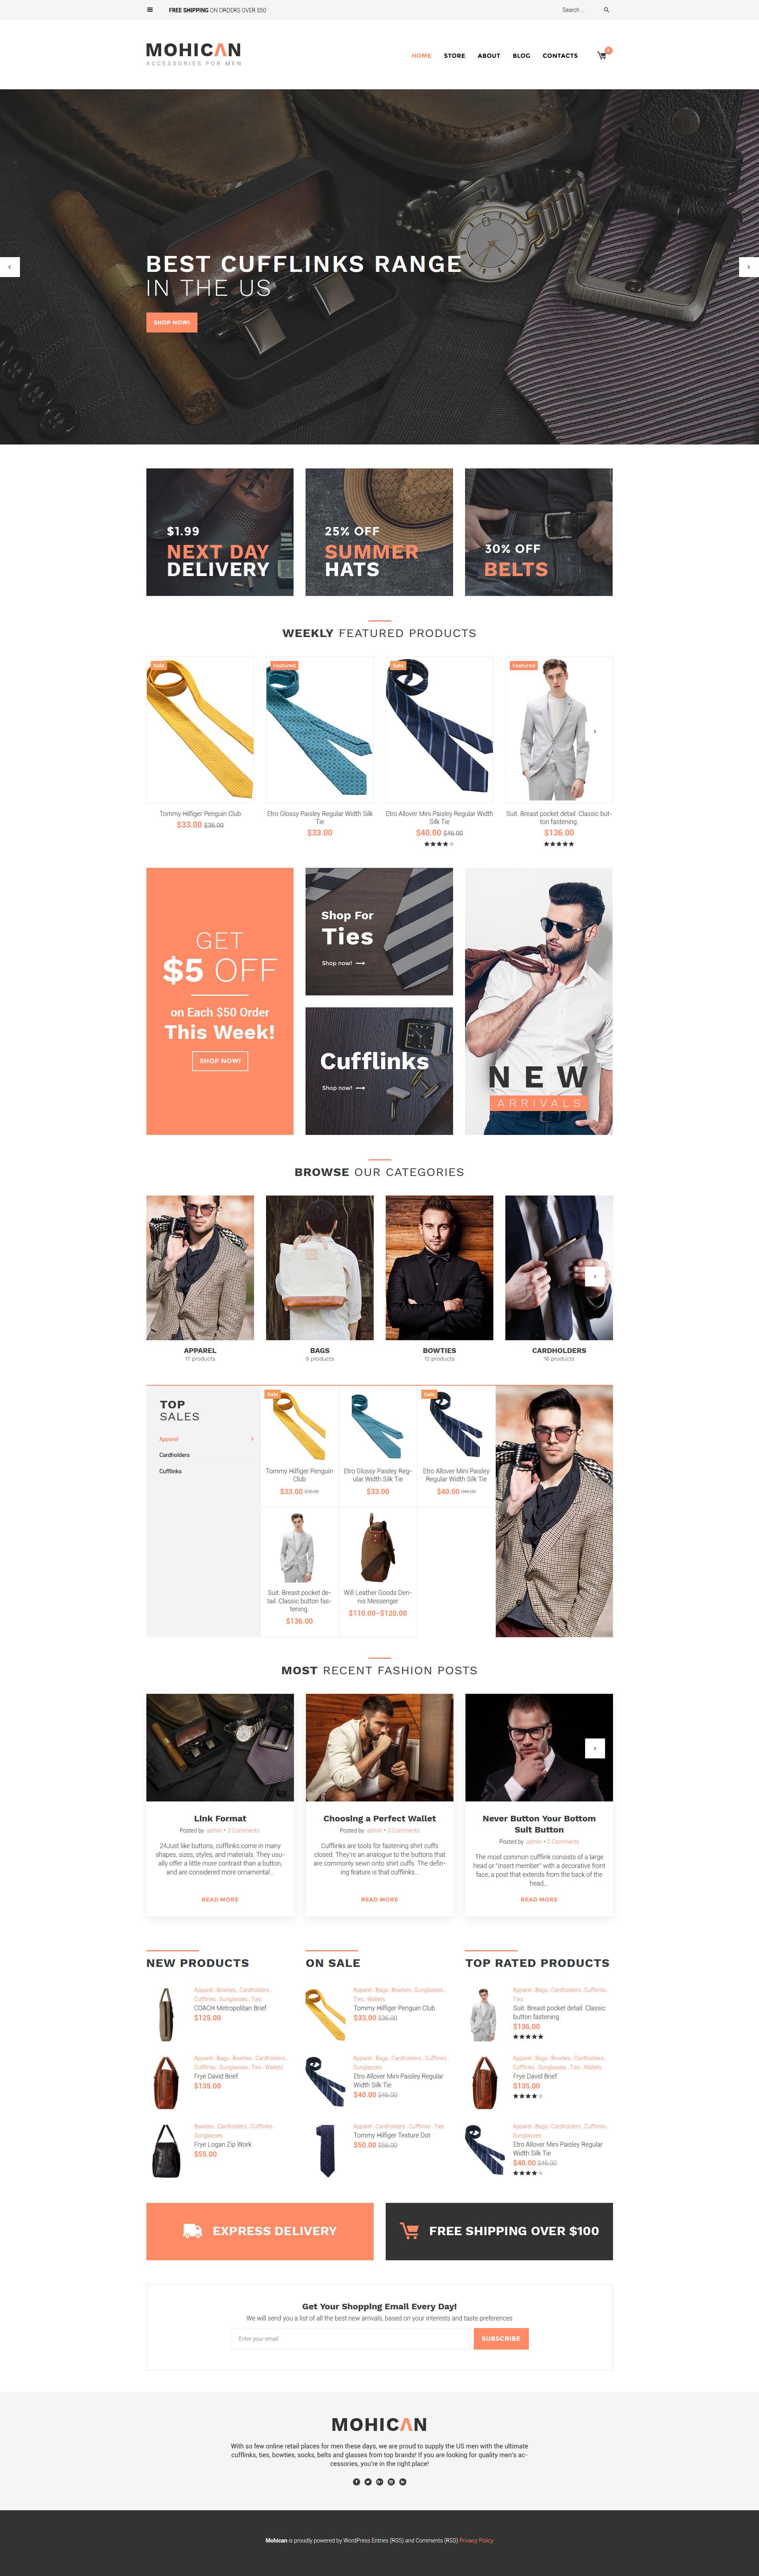 Mohican - Fashion Accessories №60098 - скриншот